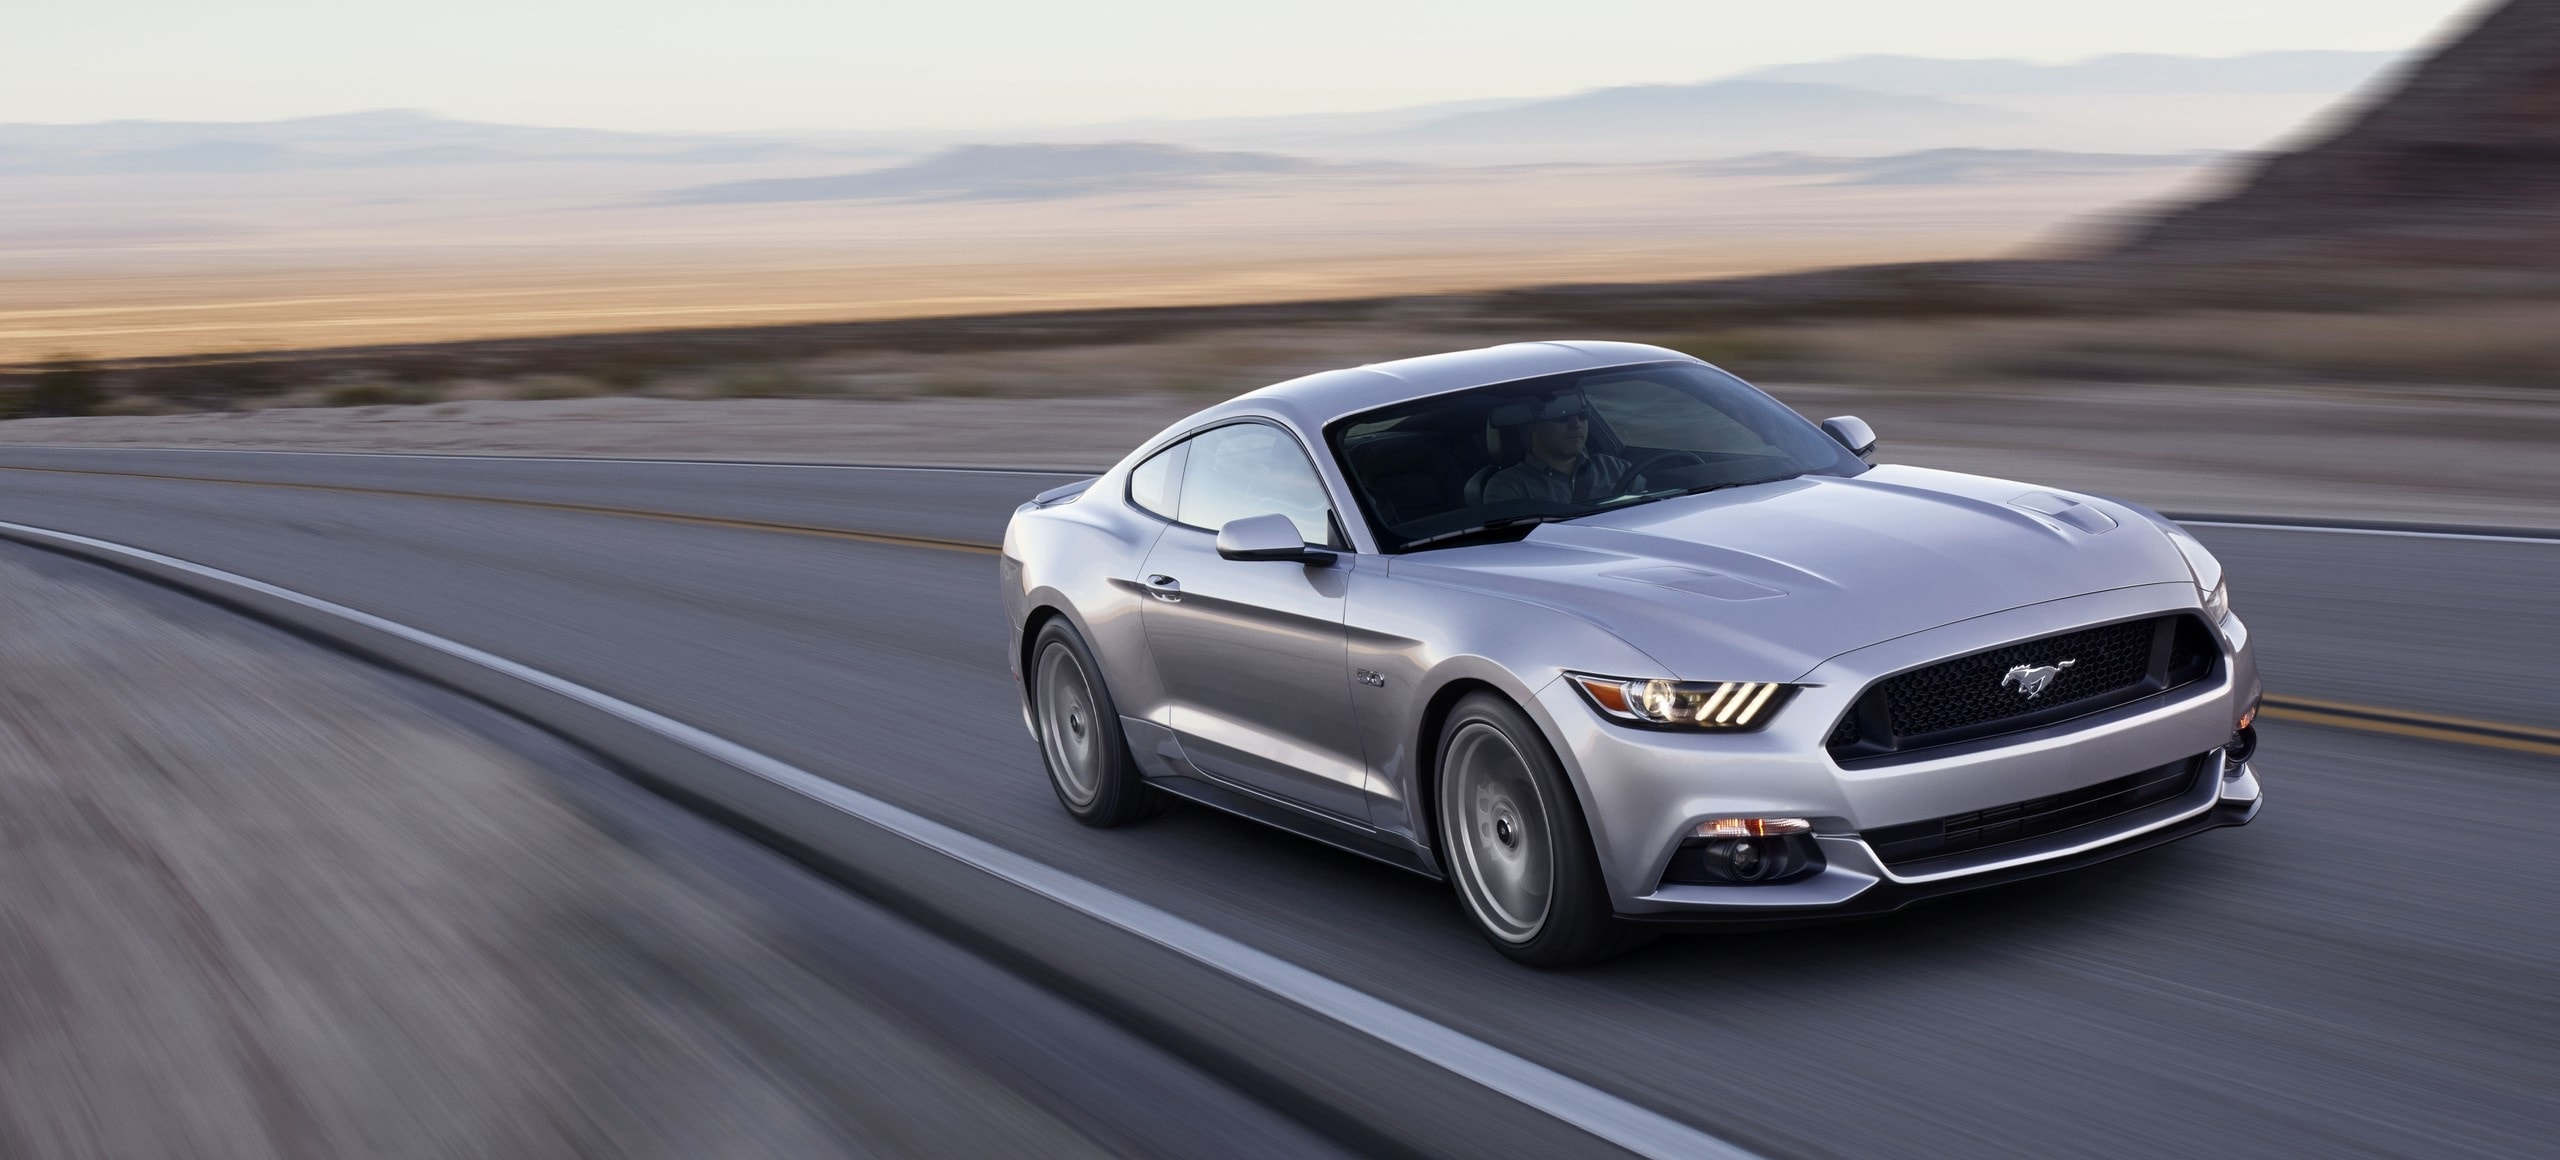 Ford Mustang Gt Hd Wallpapers 7wallpapersnet